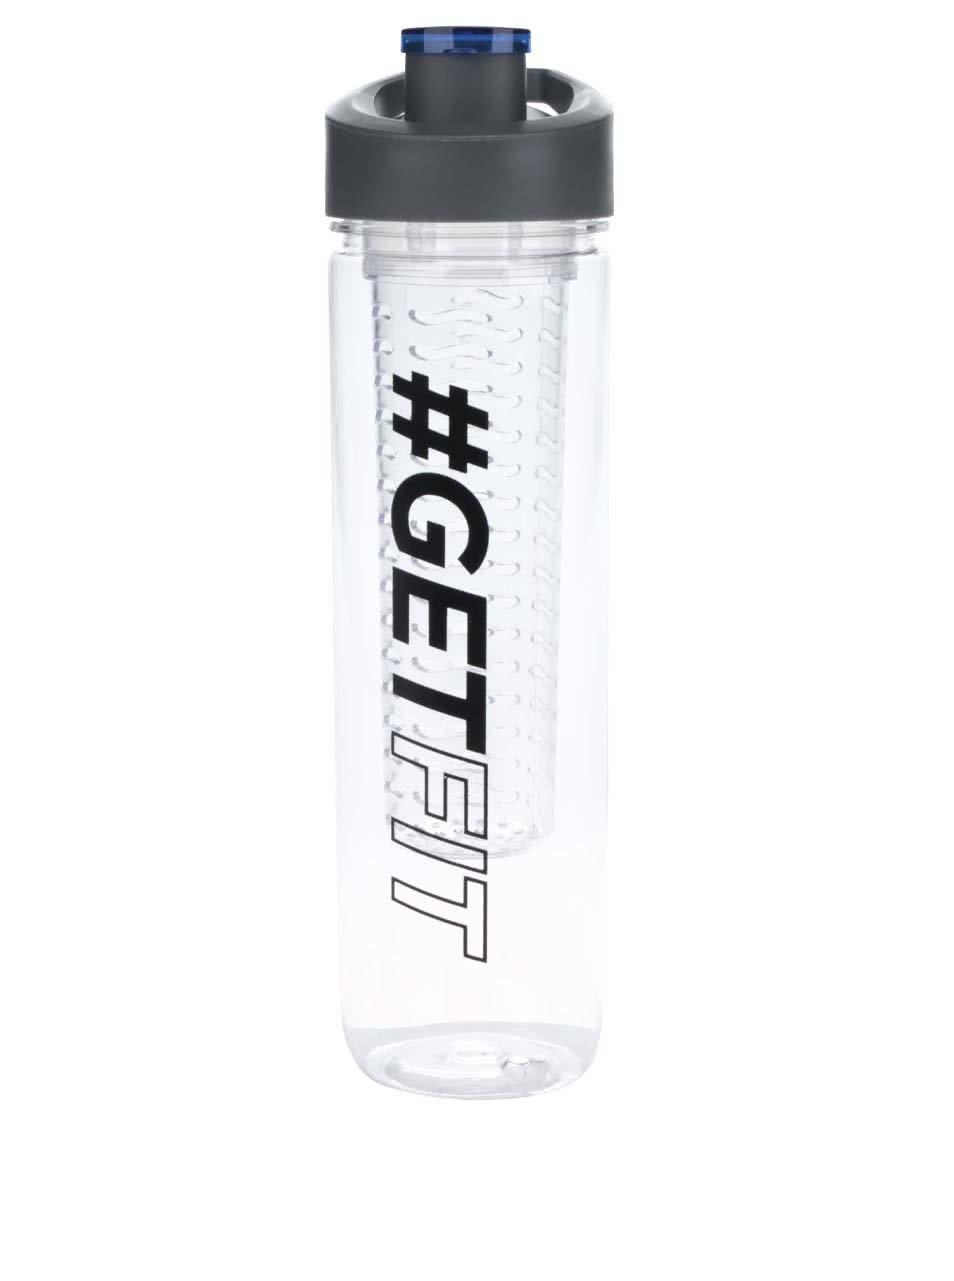 Filtrační láhev na vodu s potiskem Loooqs Get Fit